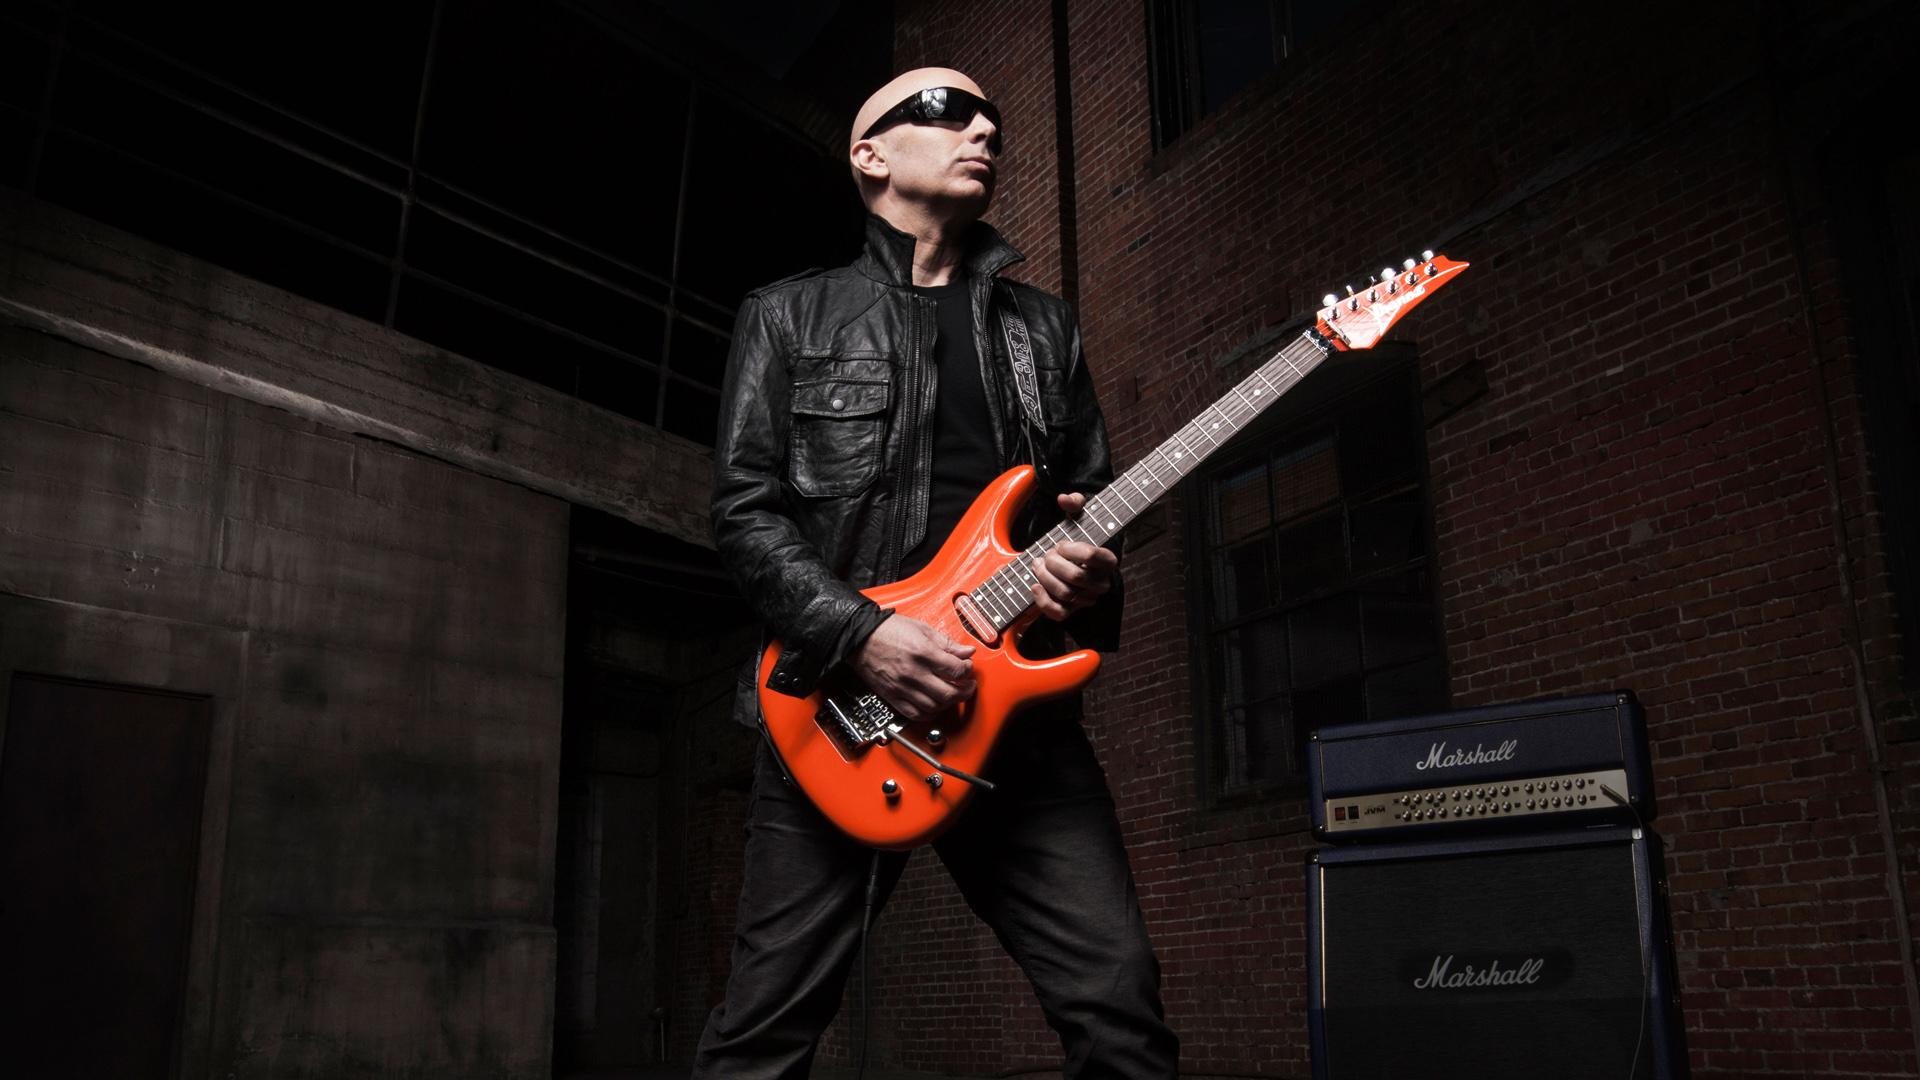 Joe Satriani backdrop wallpaper 1920x1080